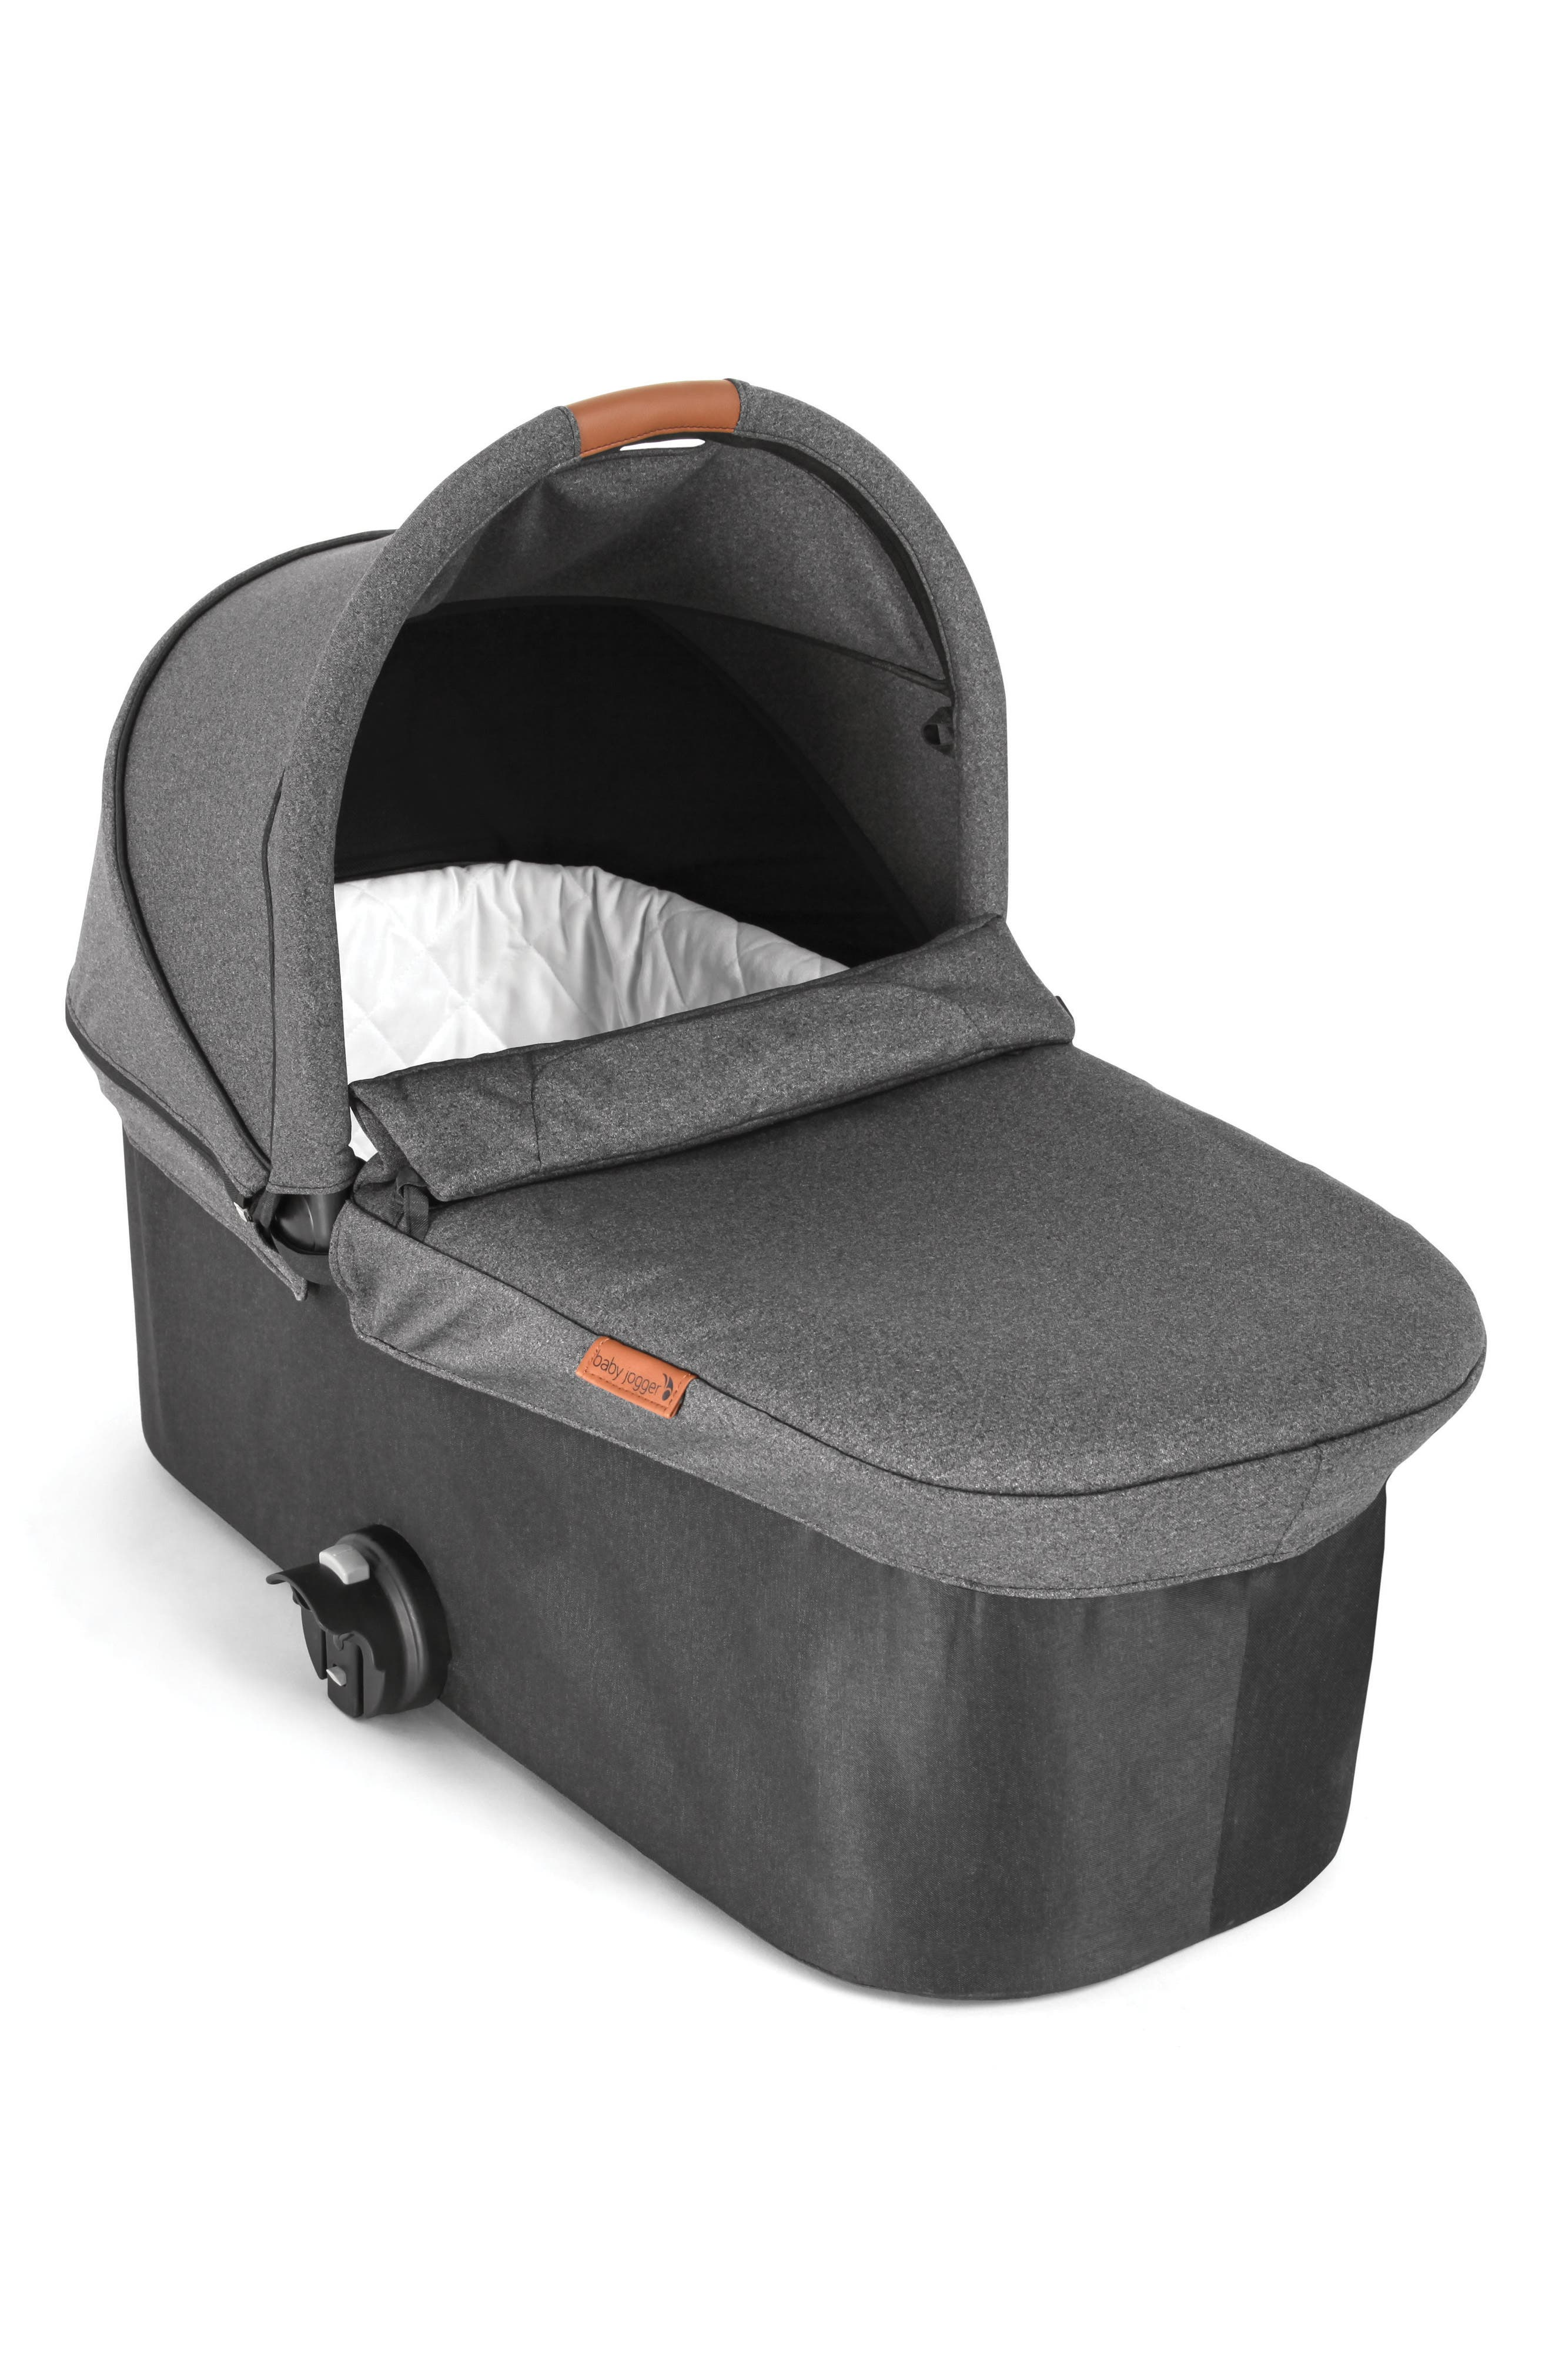 Baby Jogger Deluxe Pram Converter Kit for City Mini® 2018 Special Edition 10-Year Anniversary All-Terrain Stroller